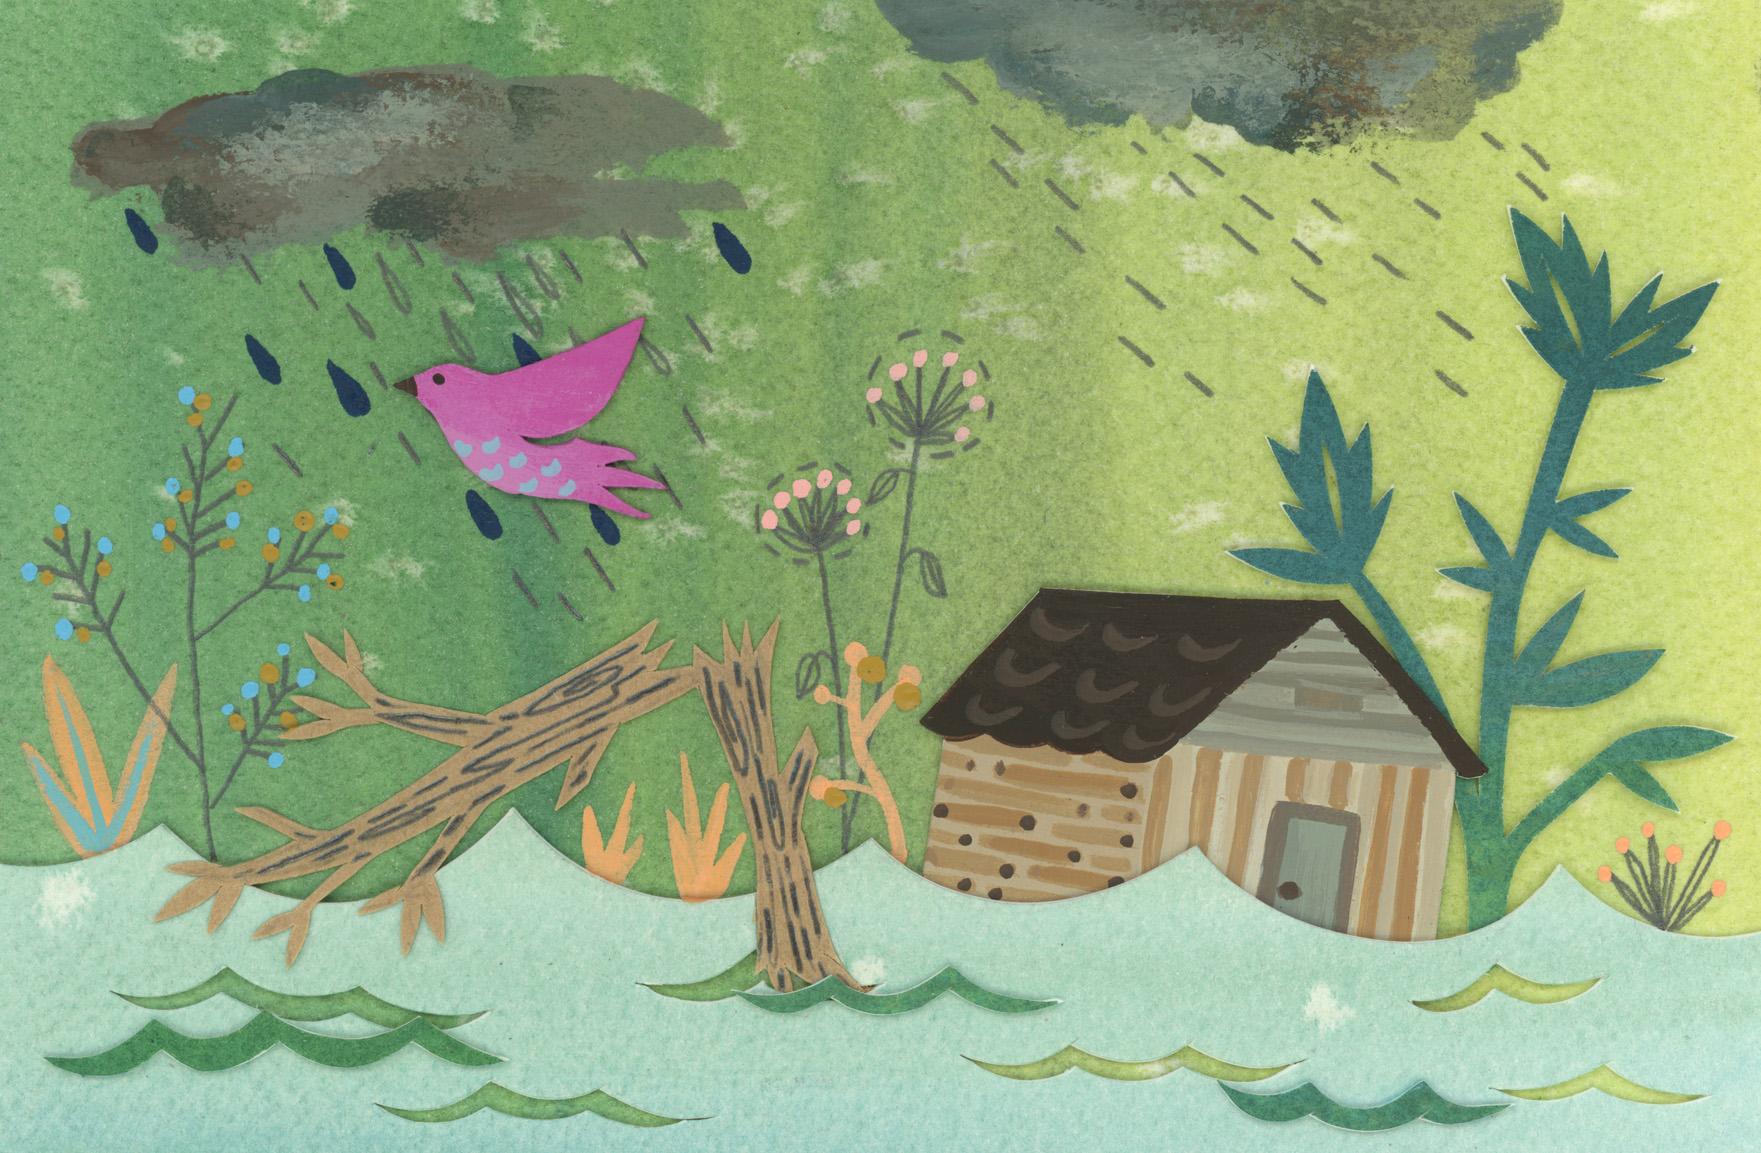 postcard_neworleans_flood_lores.jpg